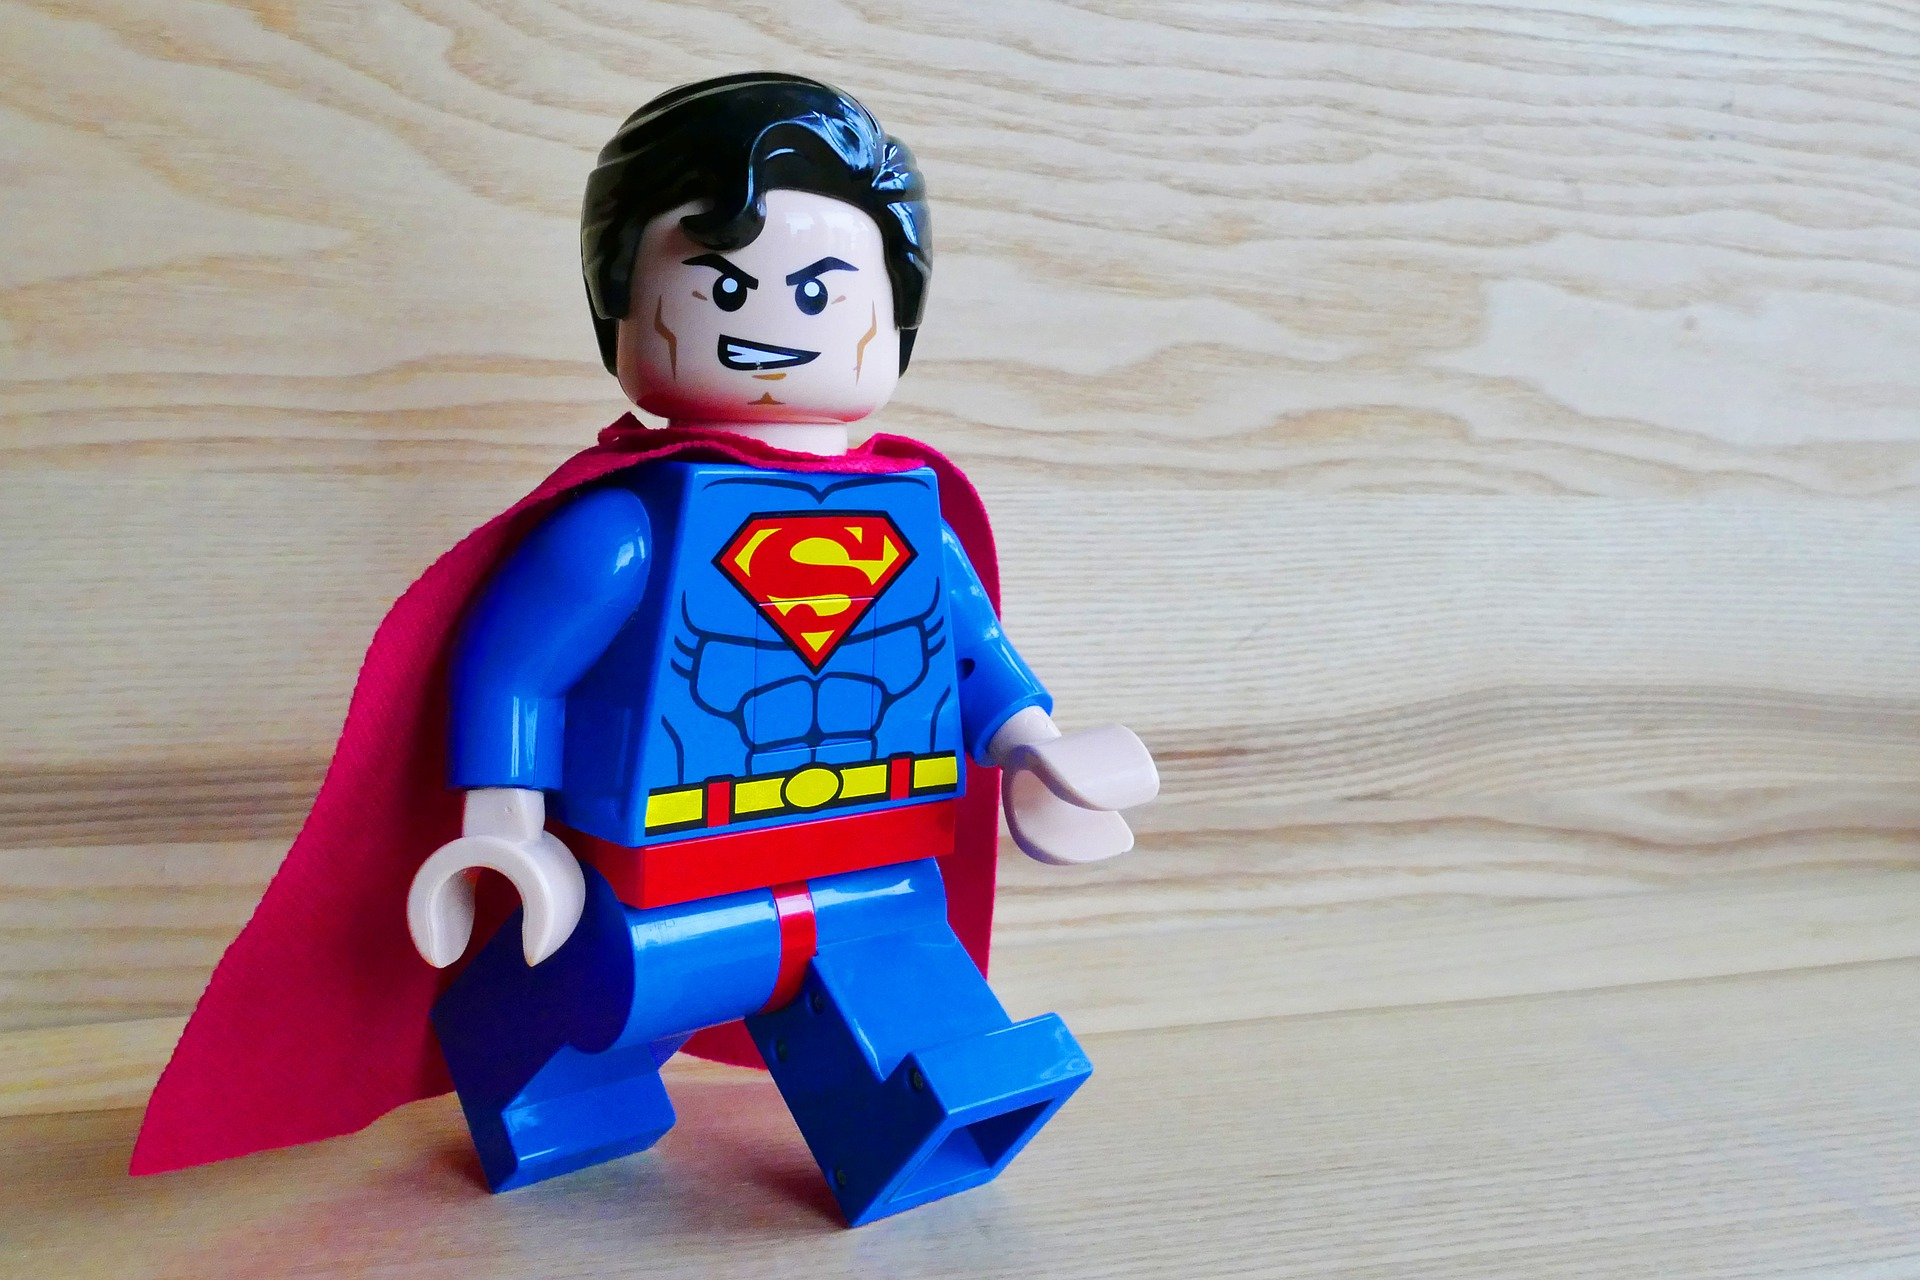 superman-1070457_1920